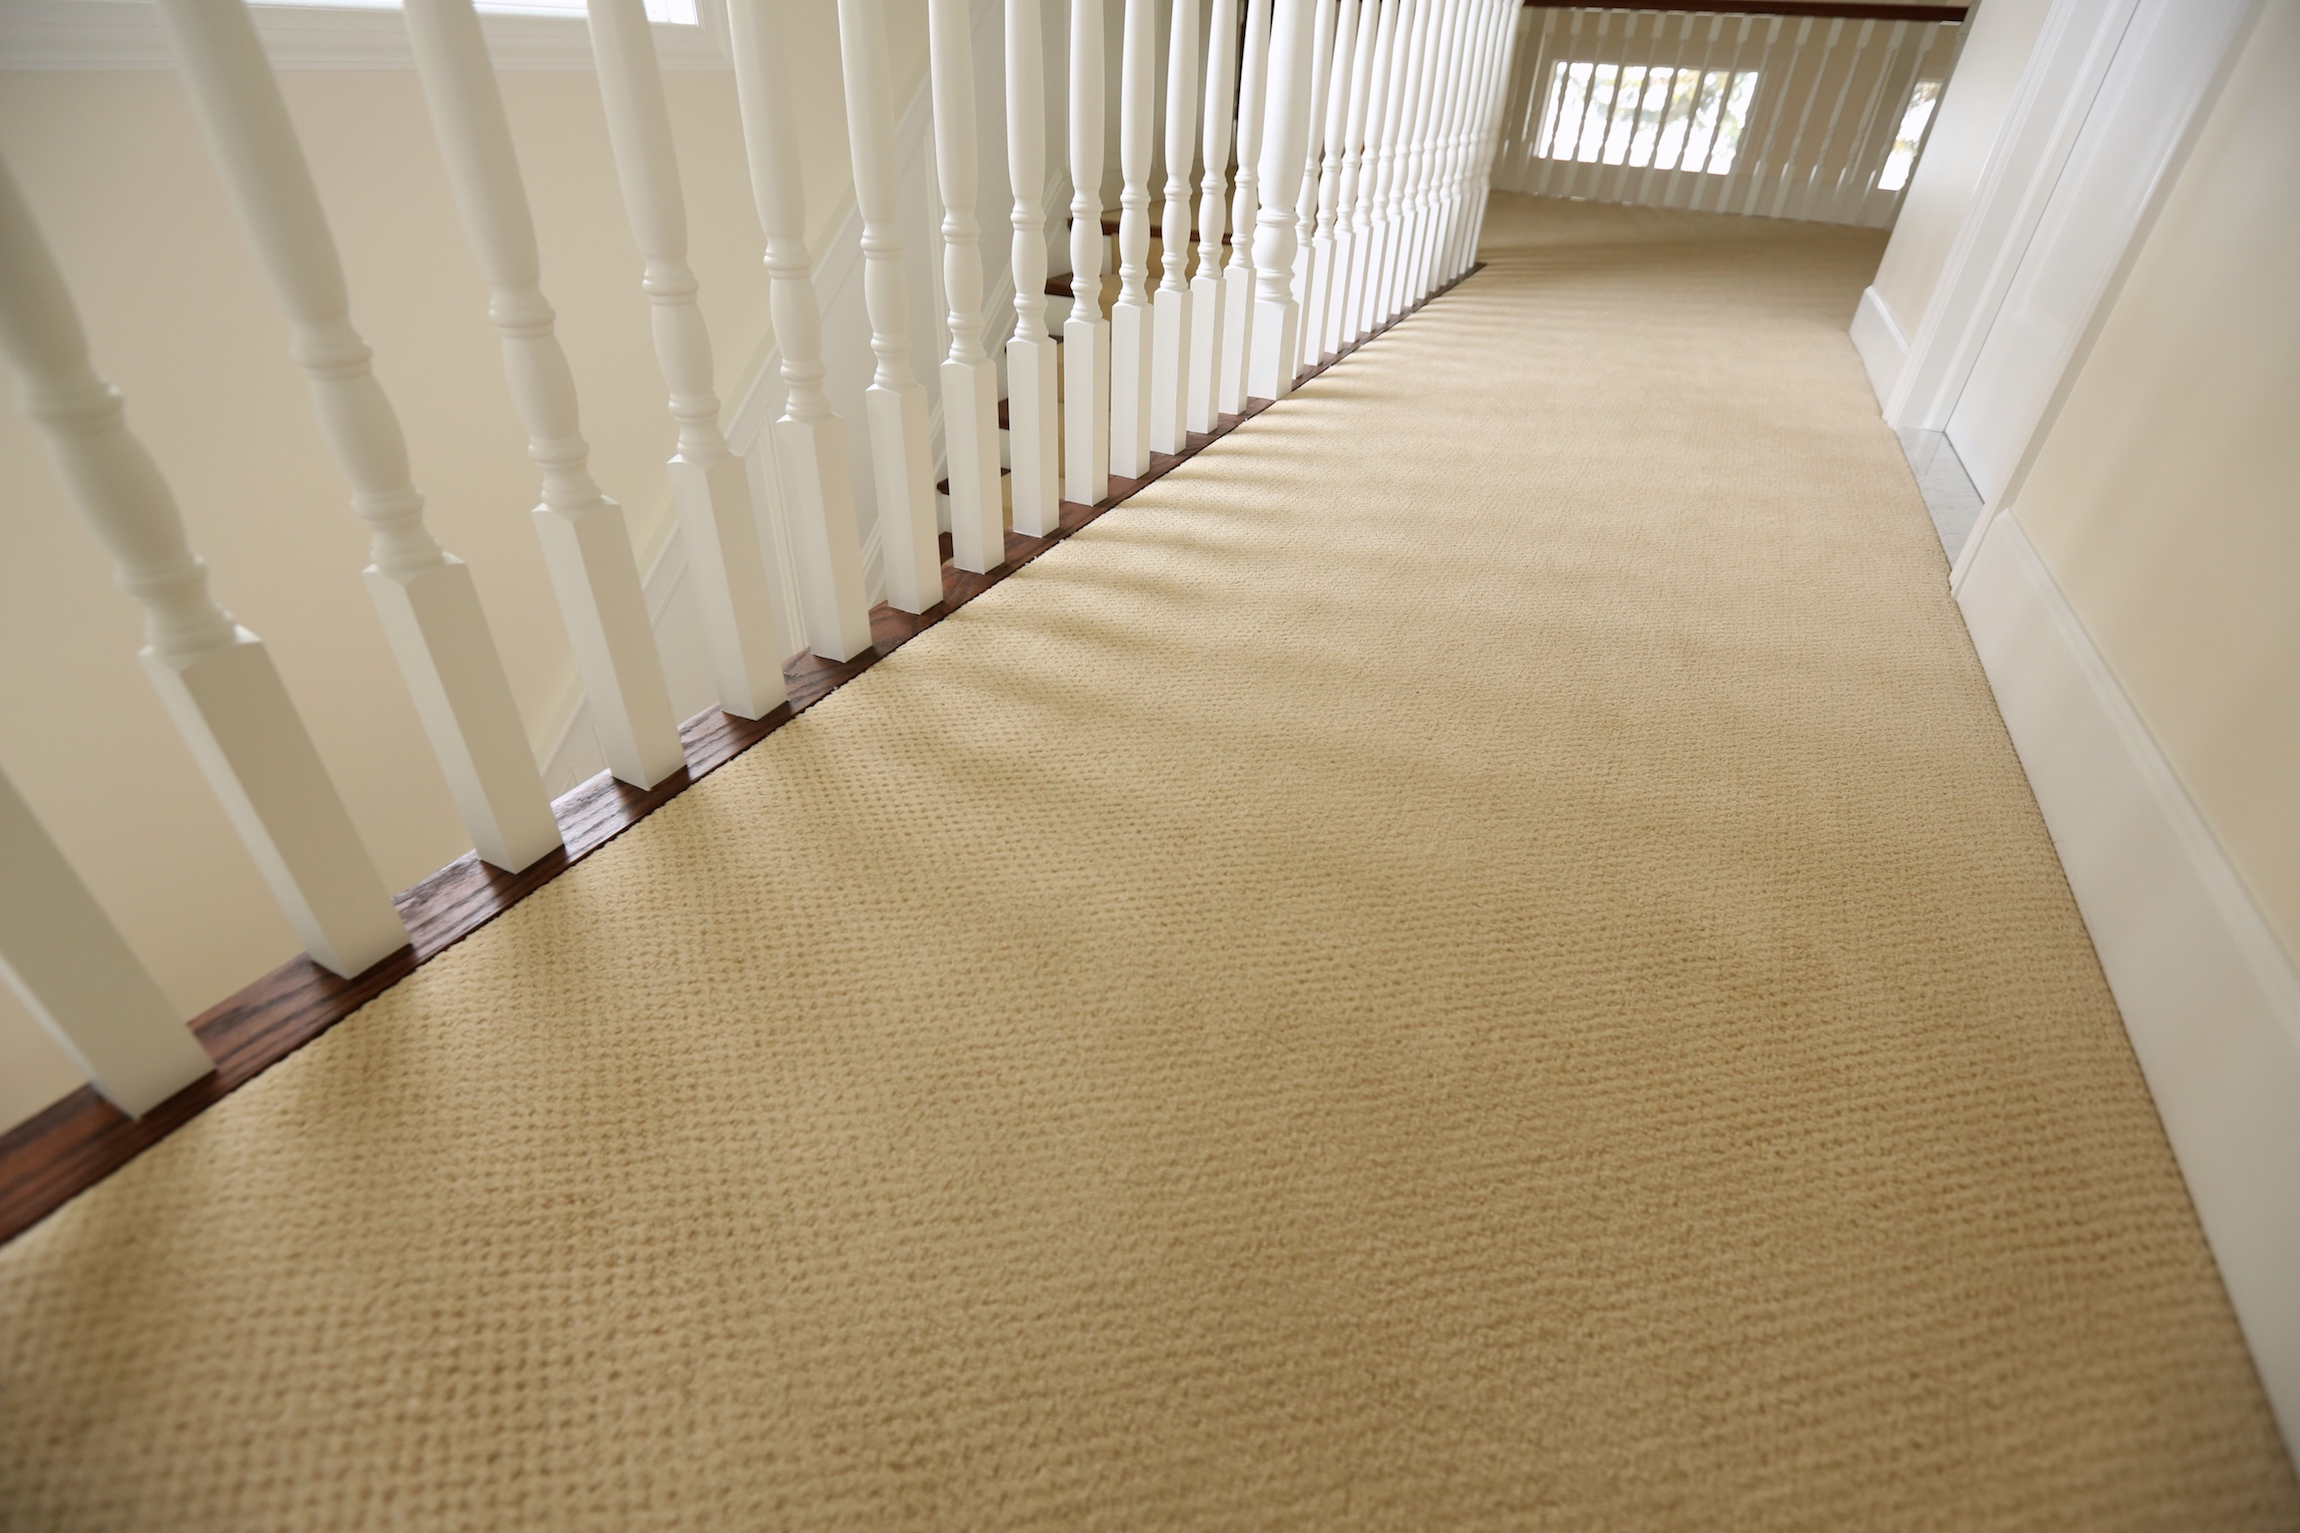 carpet rochester ny carpet ideas. Black Bedroom Furniture Sets. Home Design Ideas